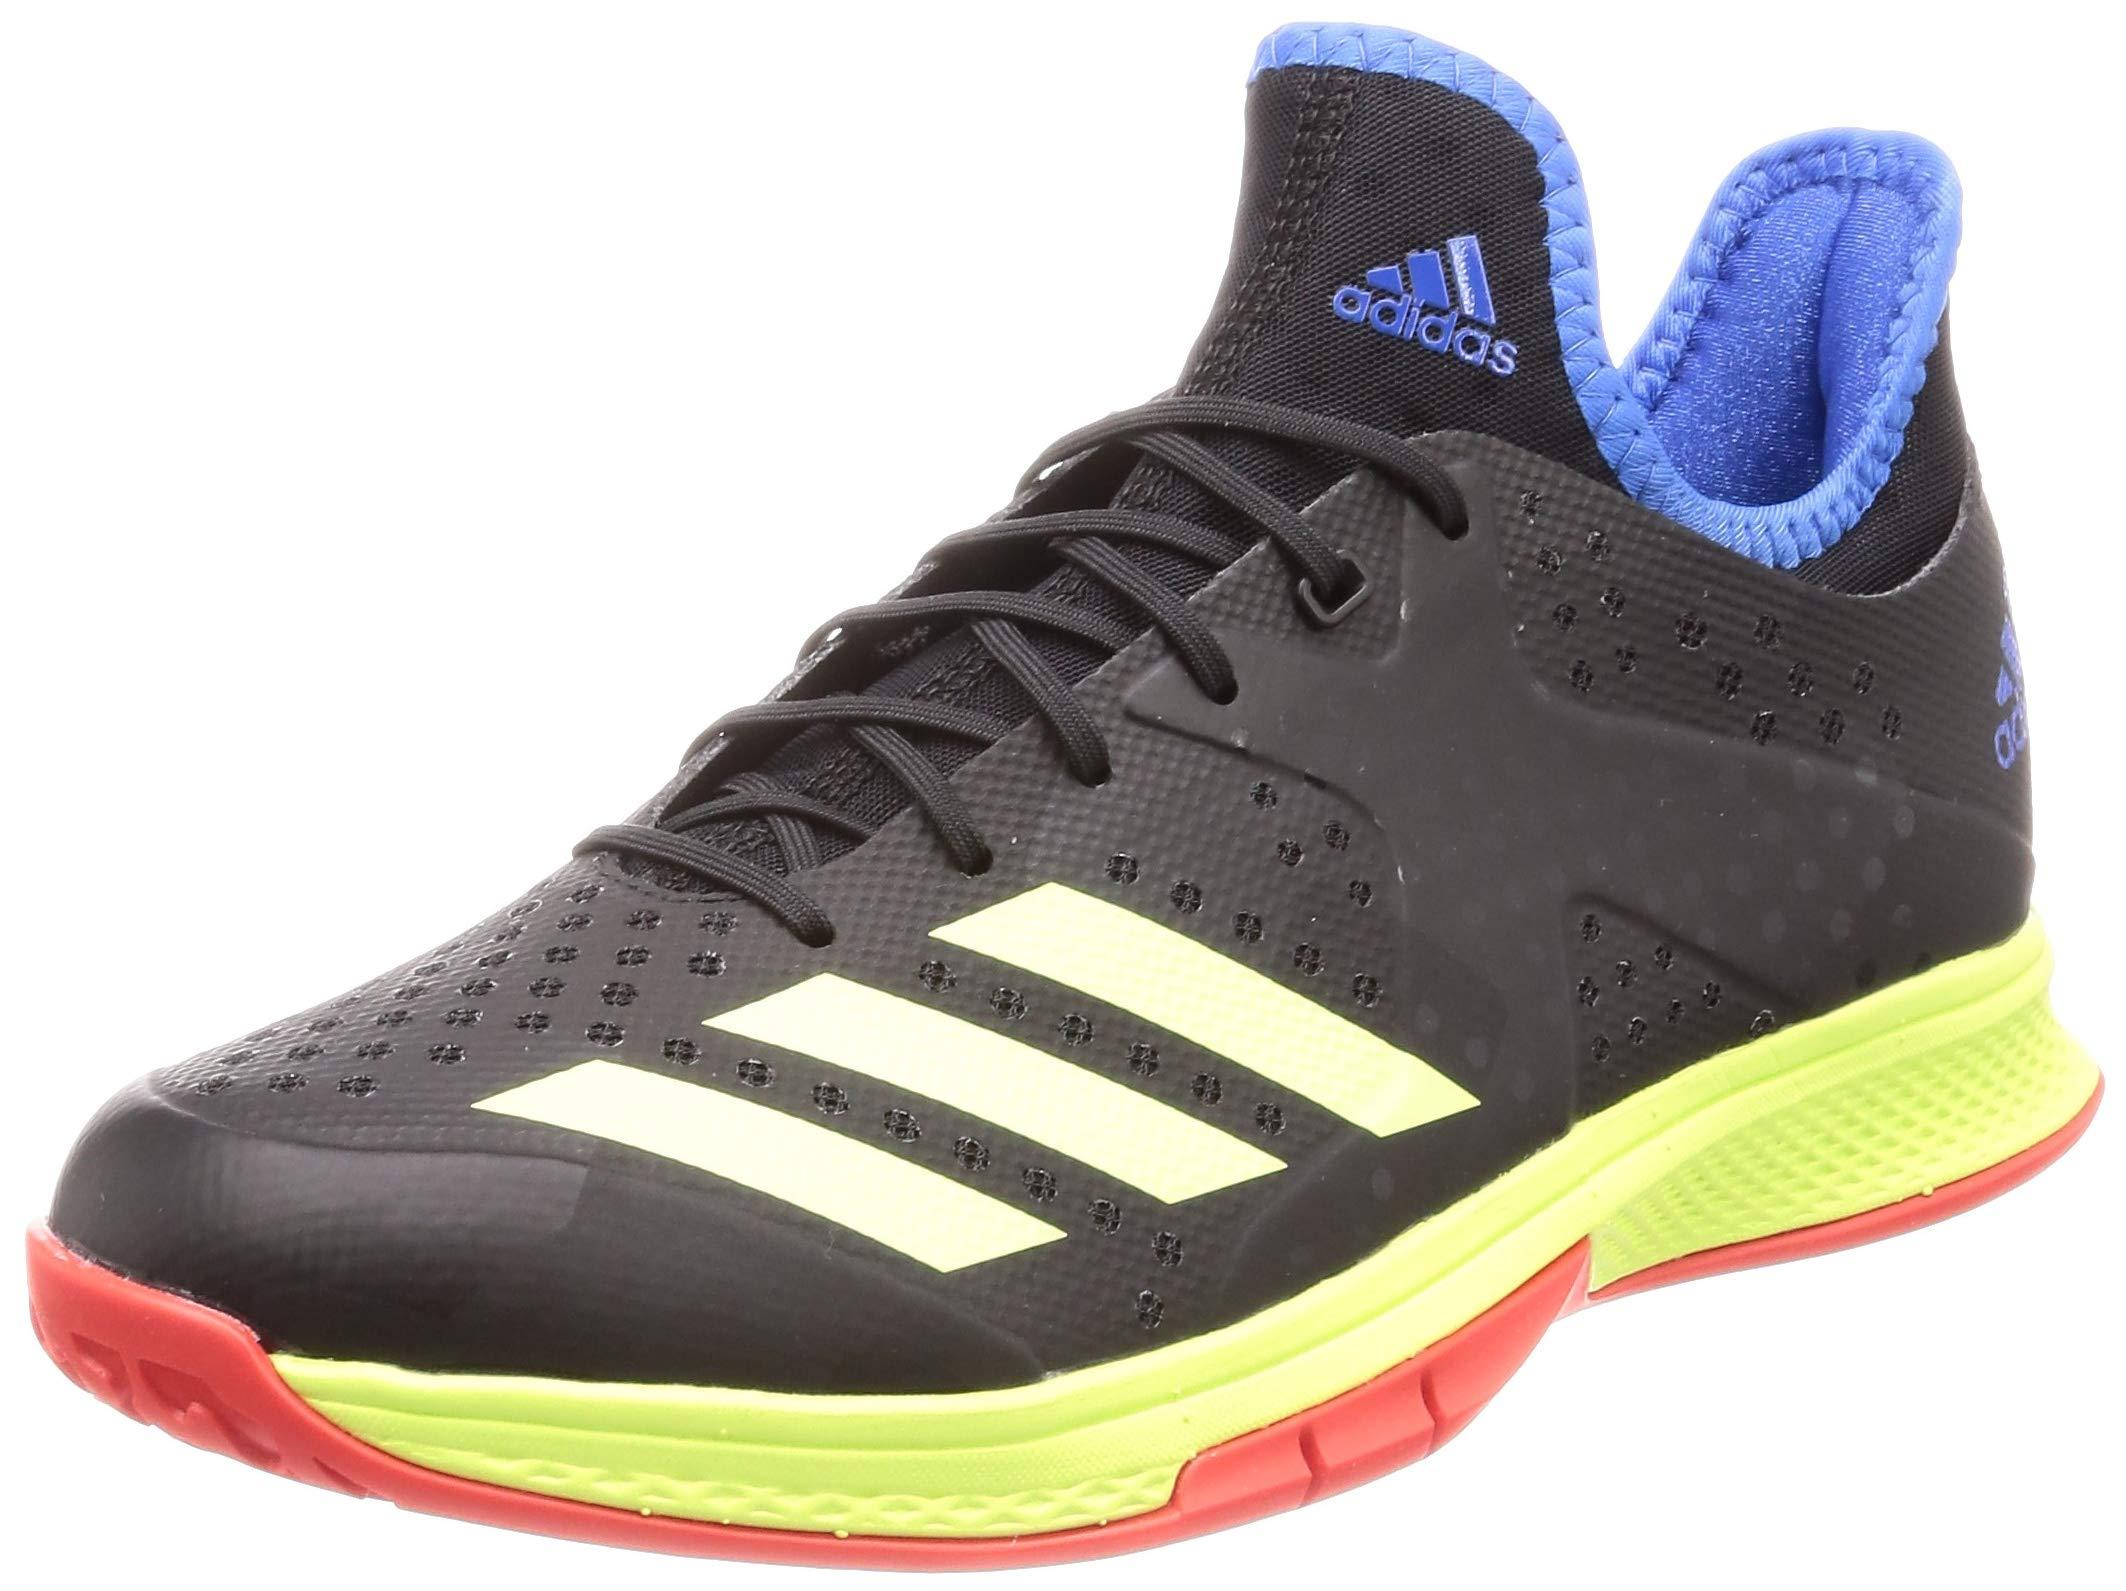 adidas Men's Counterblast Bounce Handball Shoes- Buy Online in ...